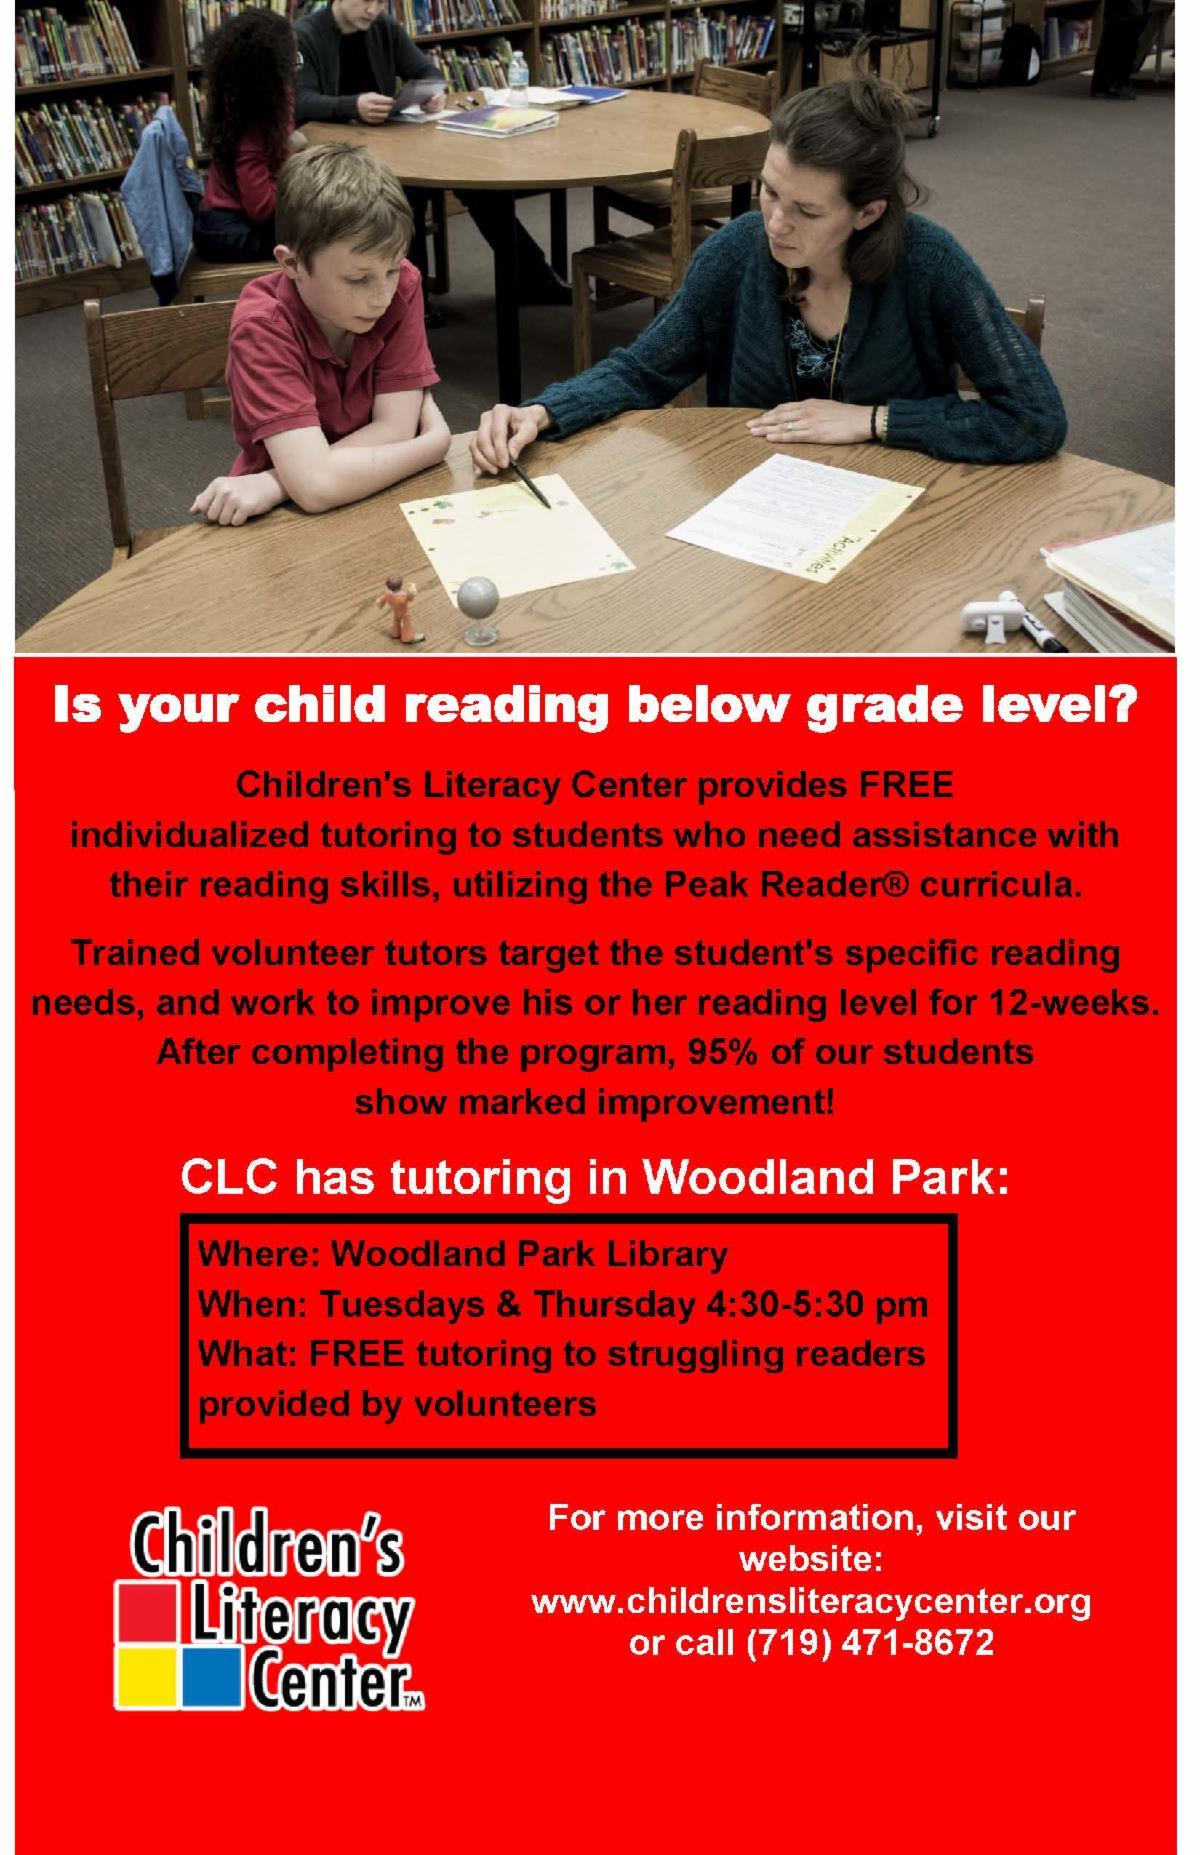 Childrens literacy